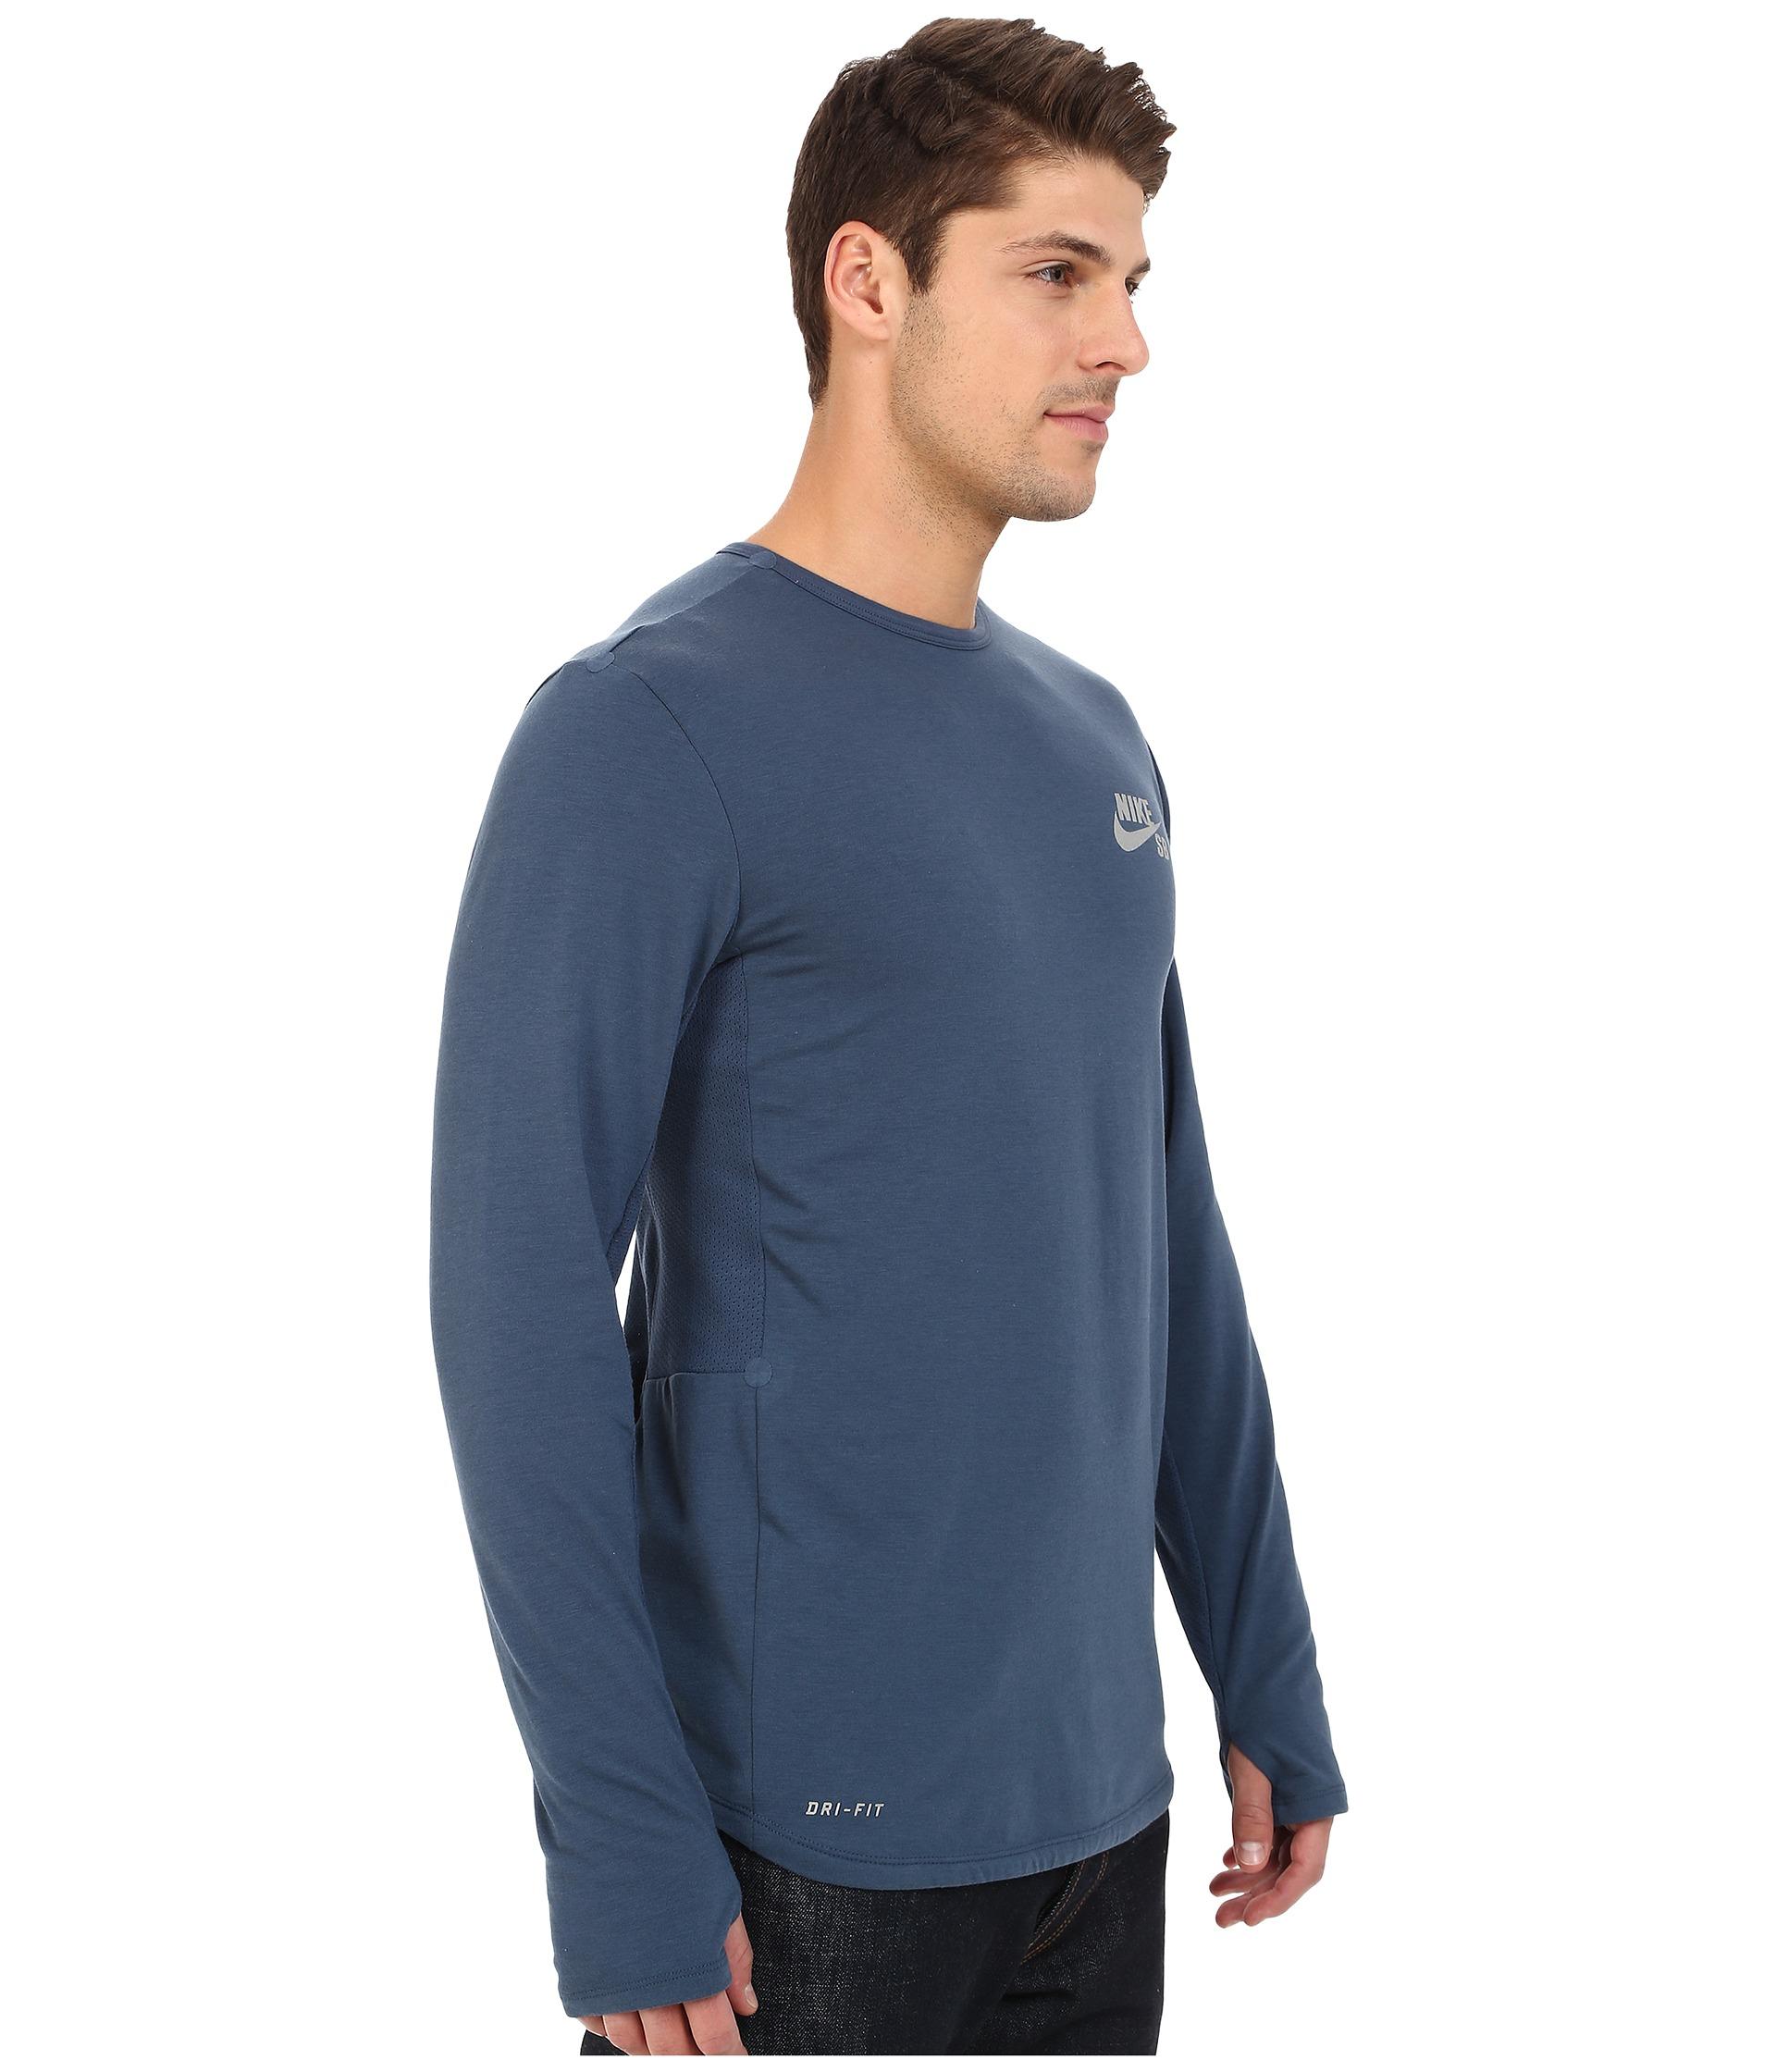 e06935b8 Nike Sb Skyline Dri-fit™ Cool Long Sleeve Crew in Blue for Men - Lyst